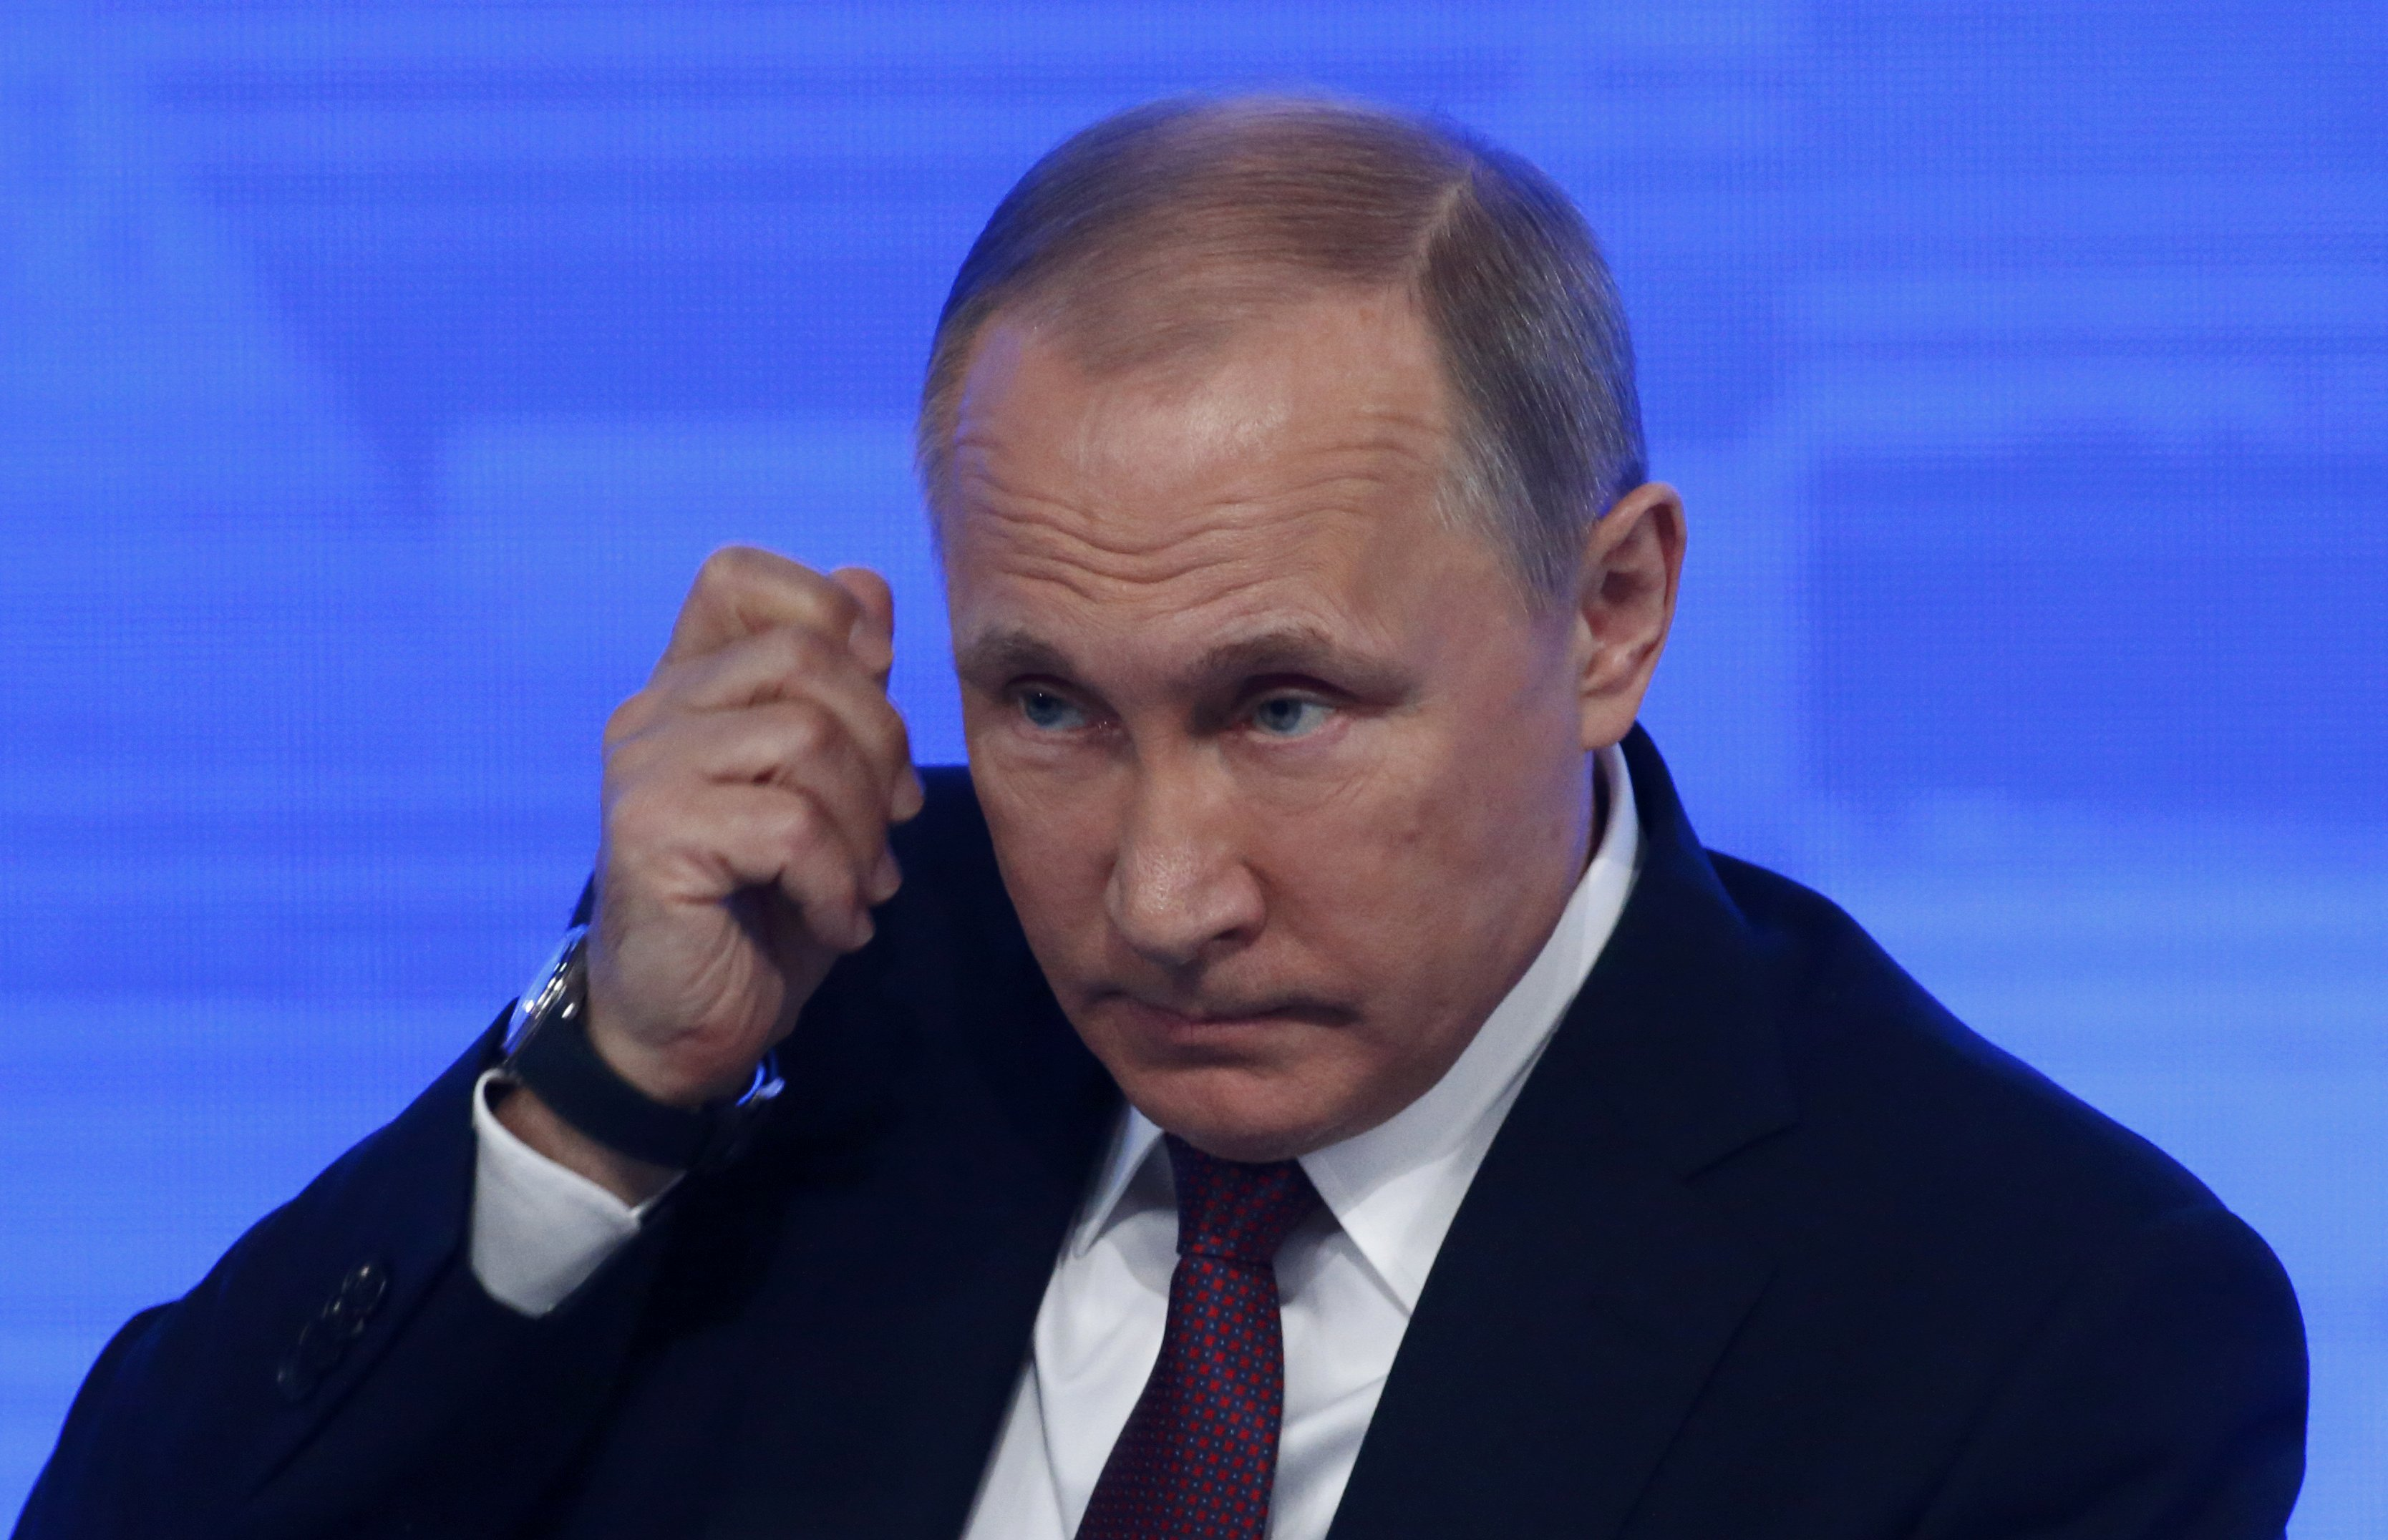 Putin's winning streak will be hard to extend